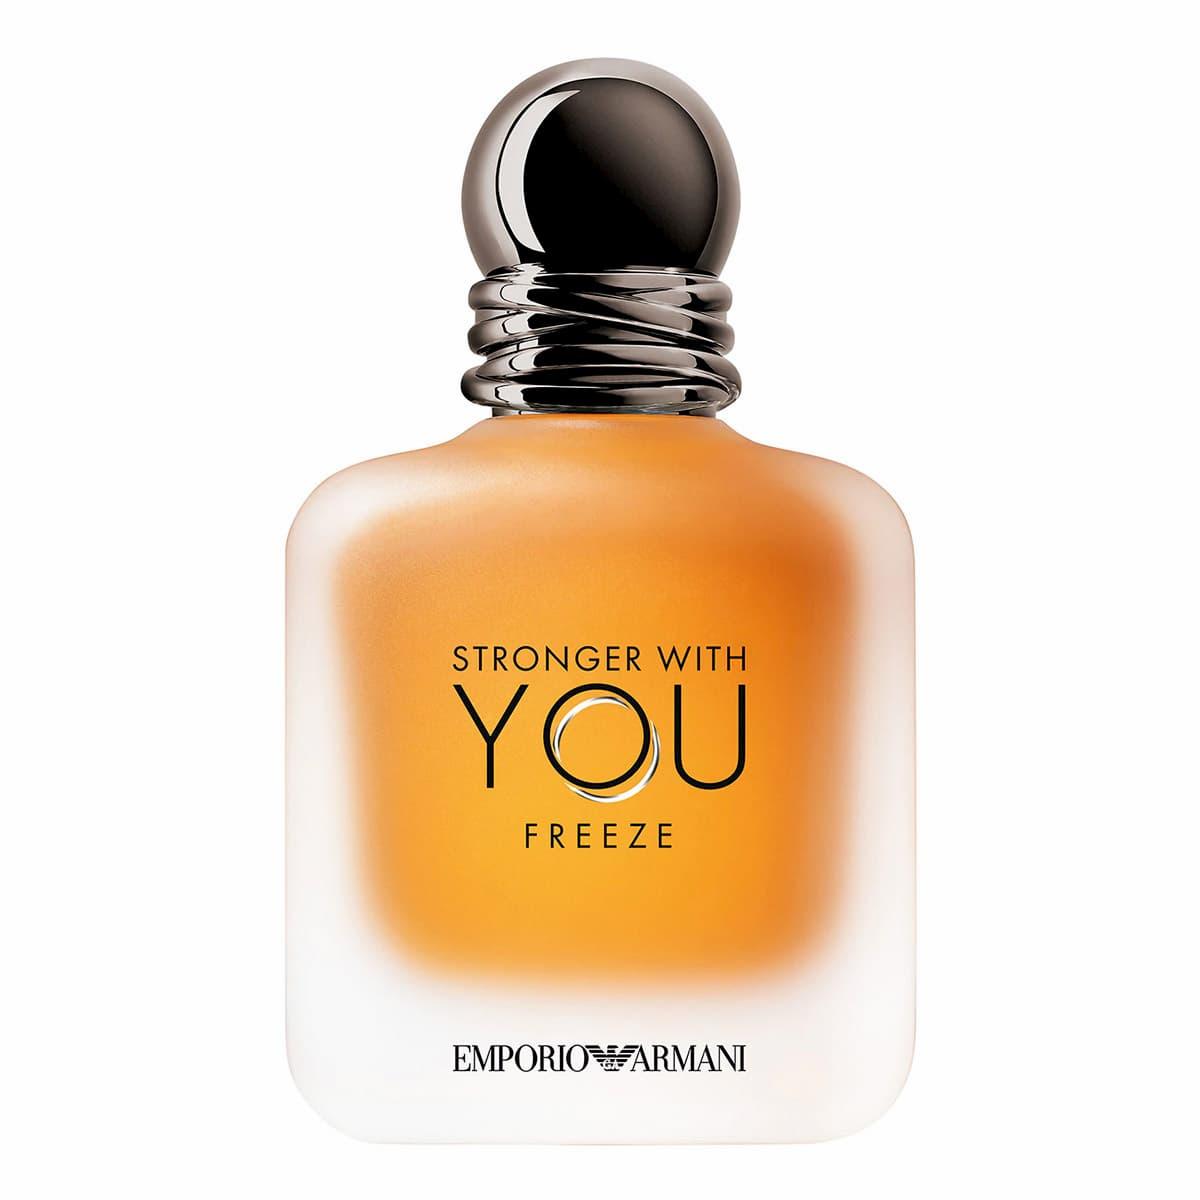 Armani - Emporio Armani Stronger with You Freeze - Eau de Toilette